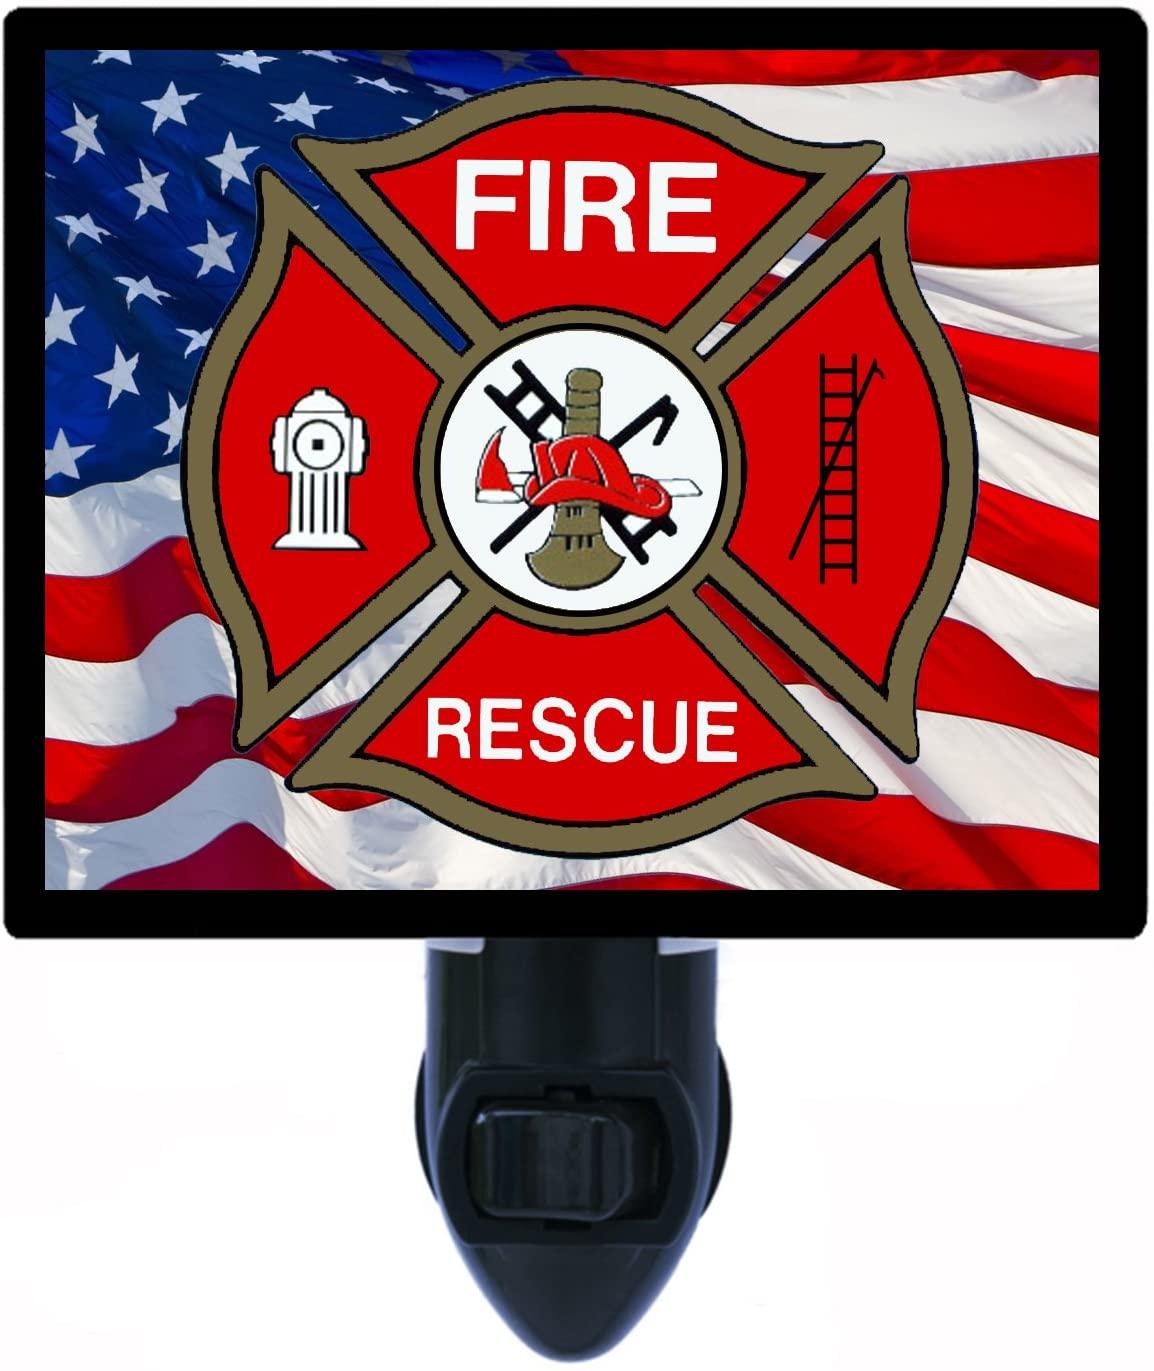 Firefighter Night Light, Fire Rescue, LED Night Light